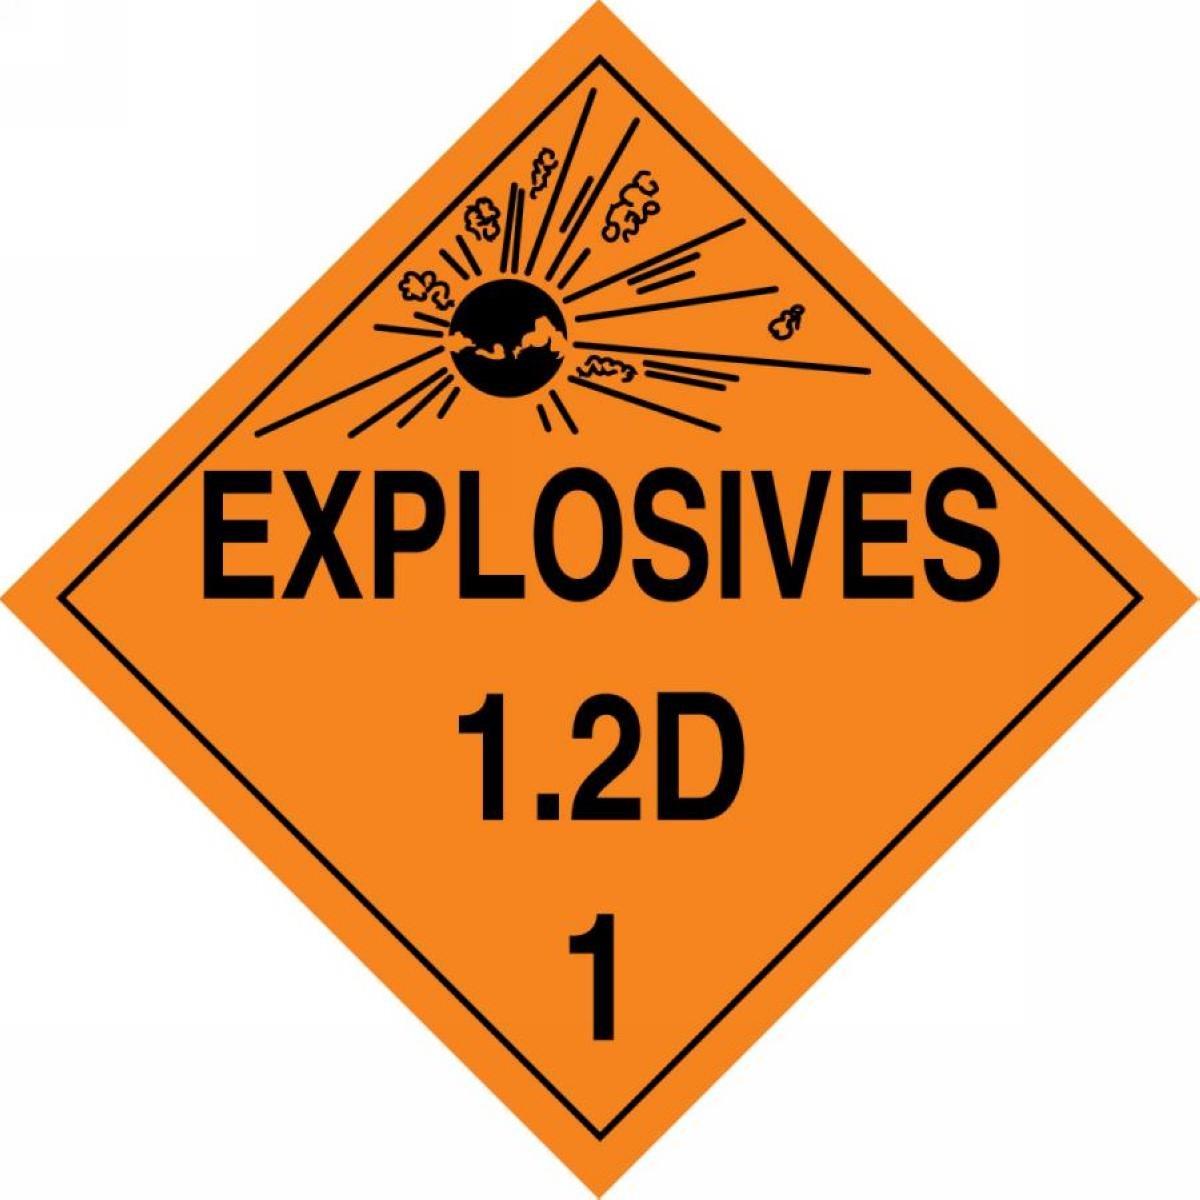 Accuform MPL112VS10 Adhesive Vinyl Hazard Class 1//Division 2D DOT Placard Black on Orange 10-3//4 Width x 10-3//4 Length LegendEXPLOSIVES 1.2D 1 with Graphic Pack of 10